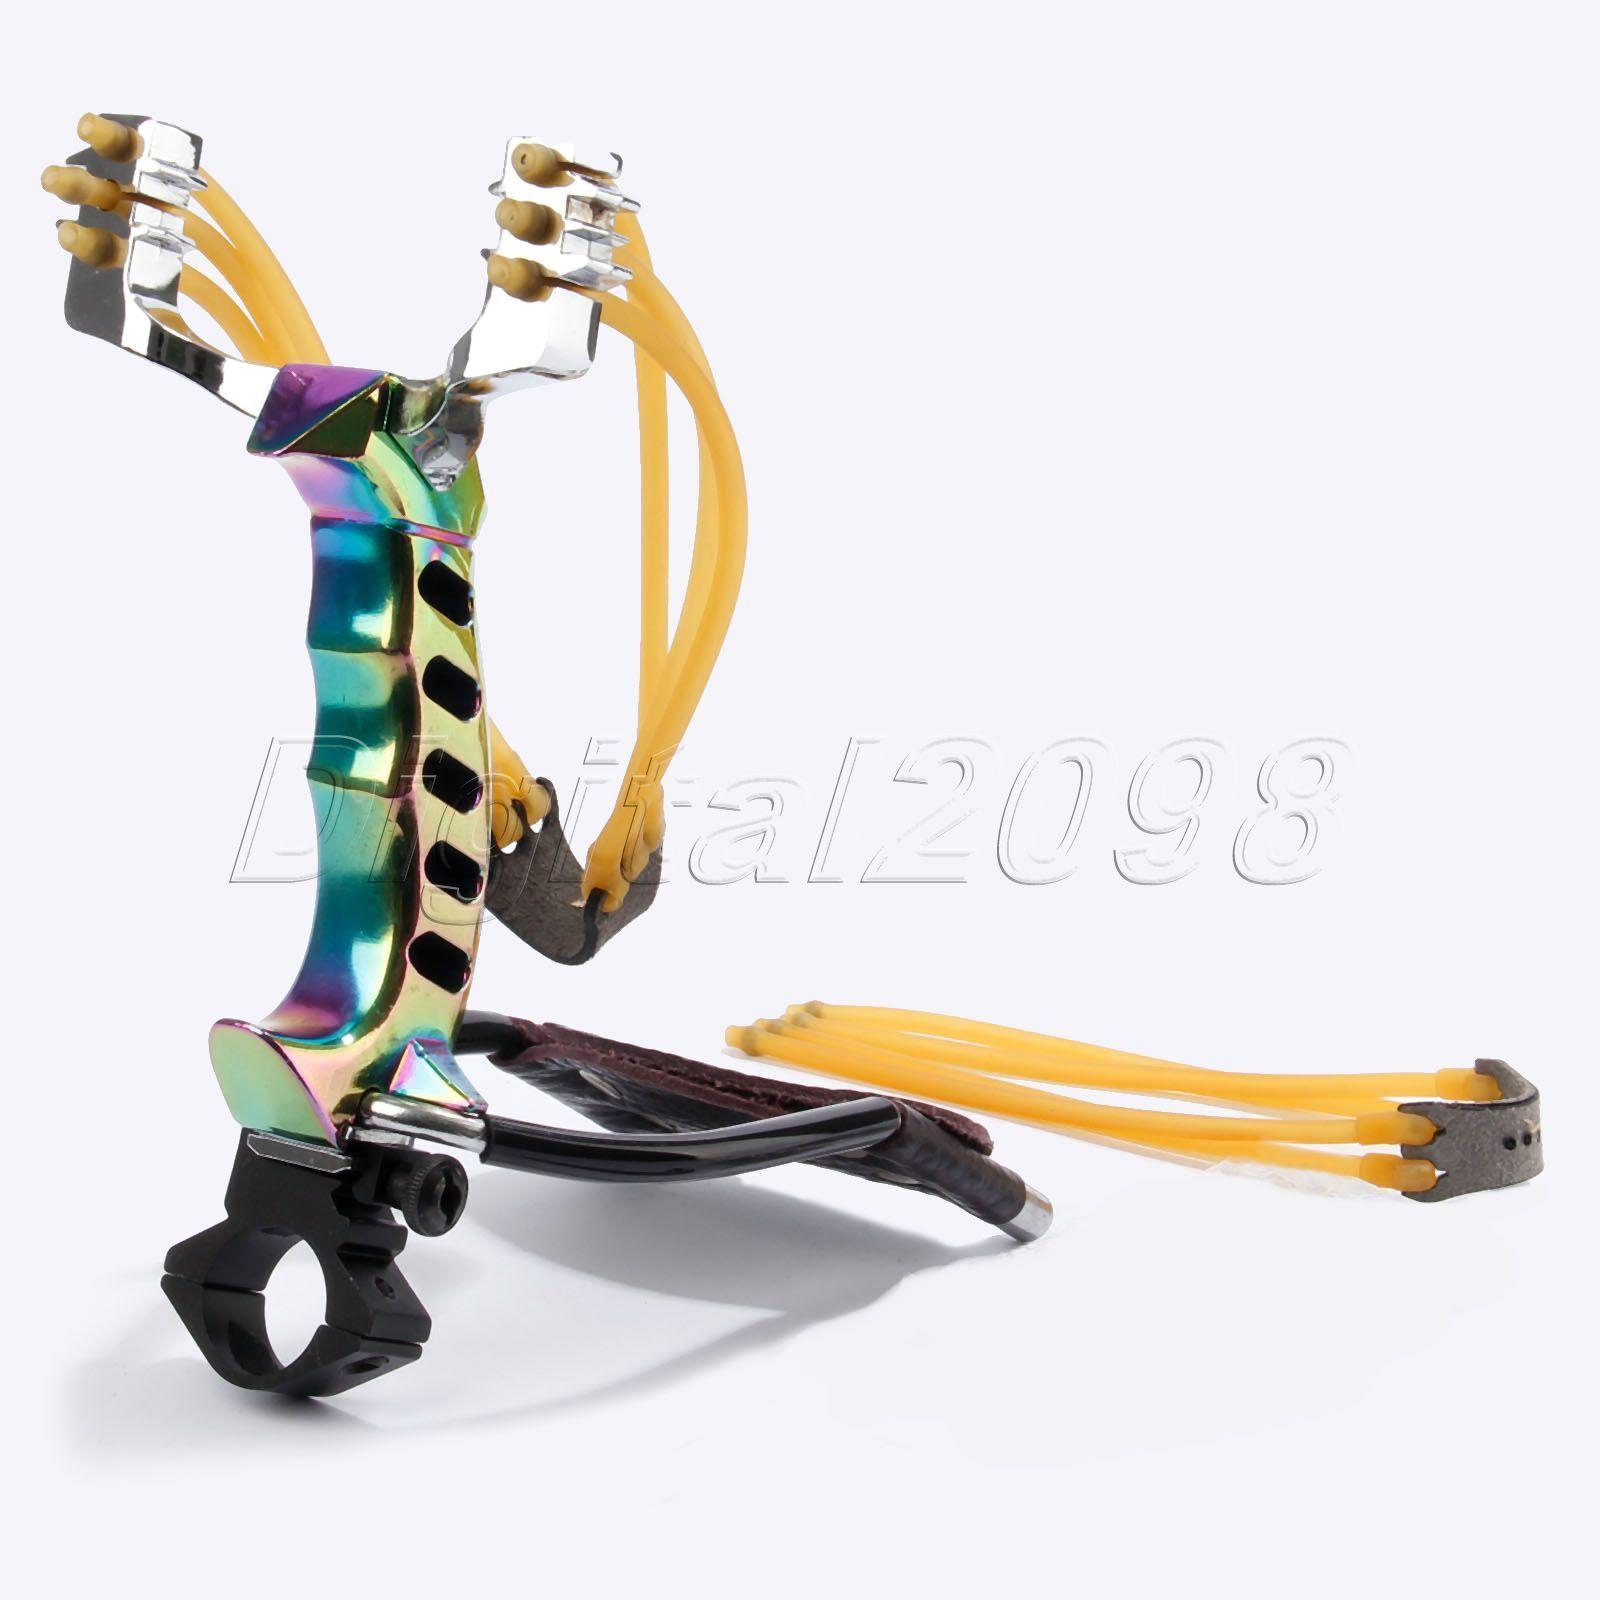 Powerful Sniper Slingshot Folding Wrist Brace High Velocity Hunting Catapult